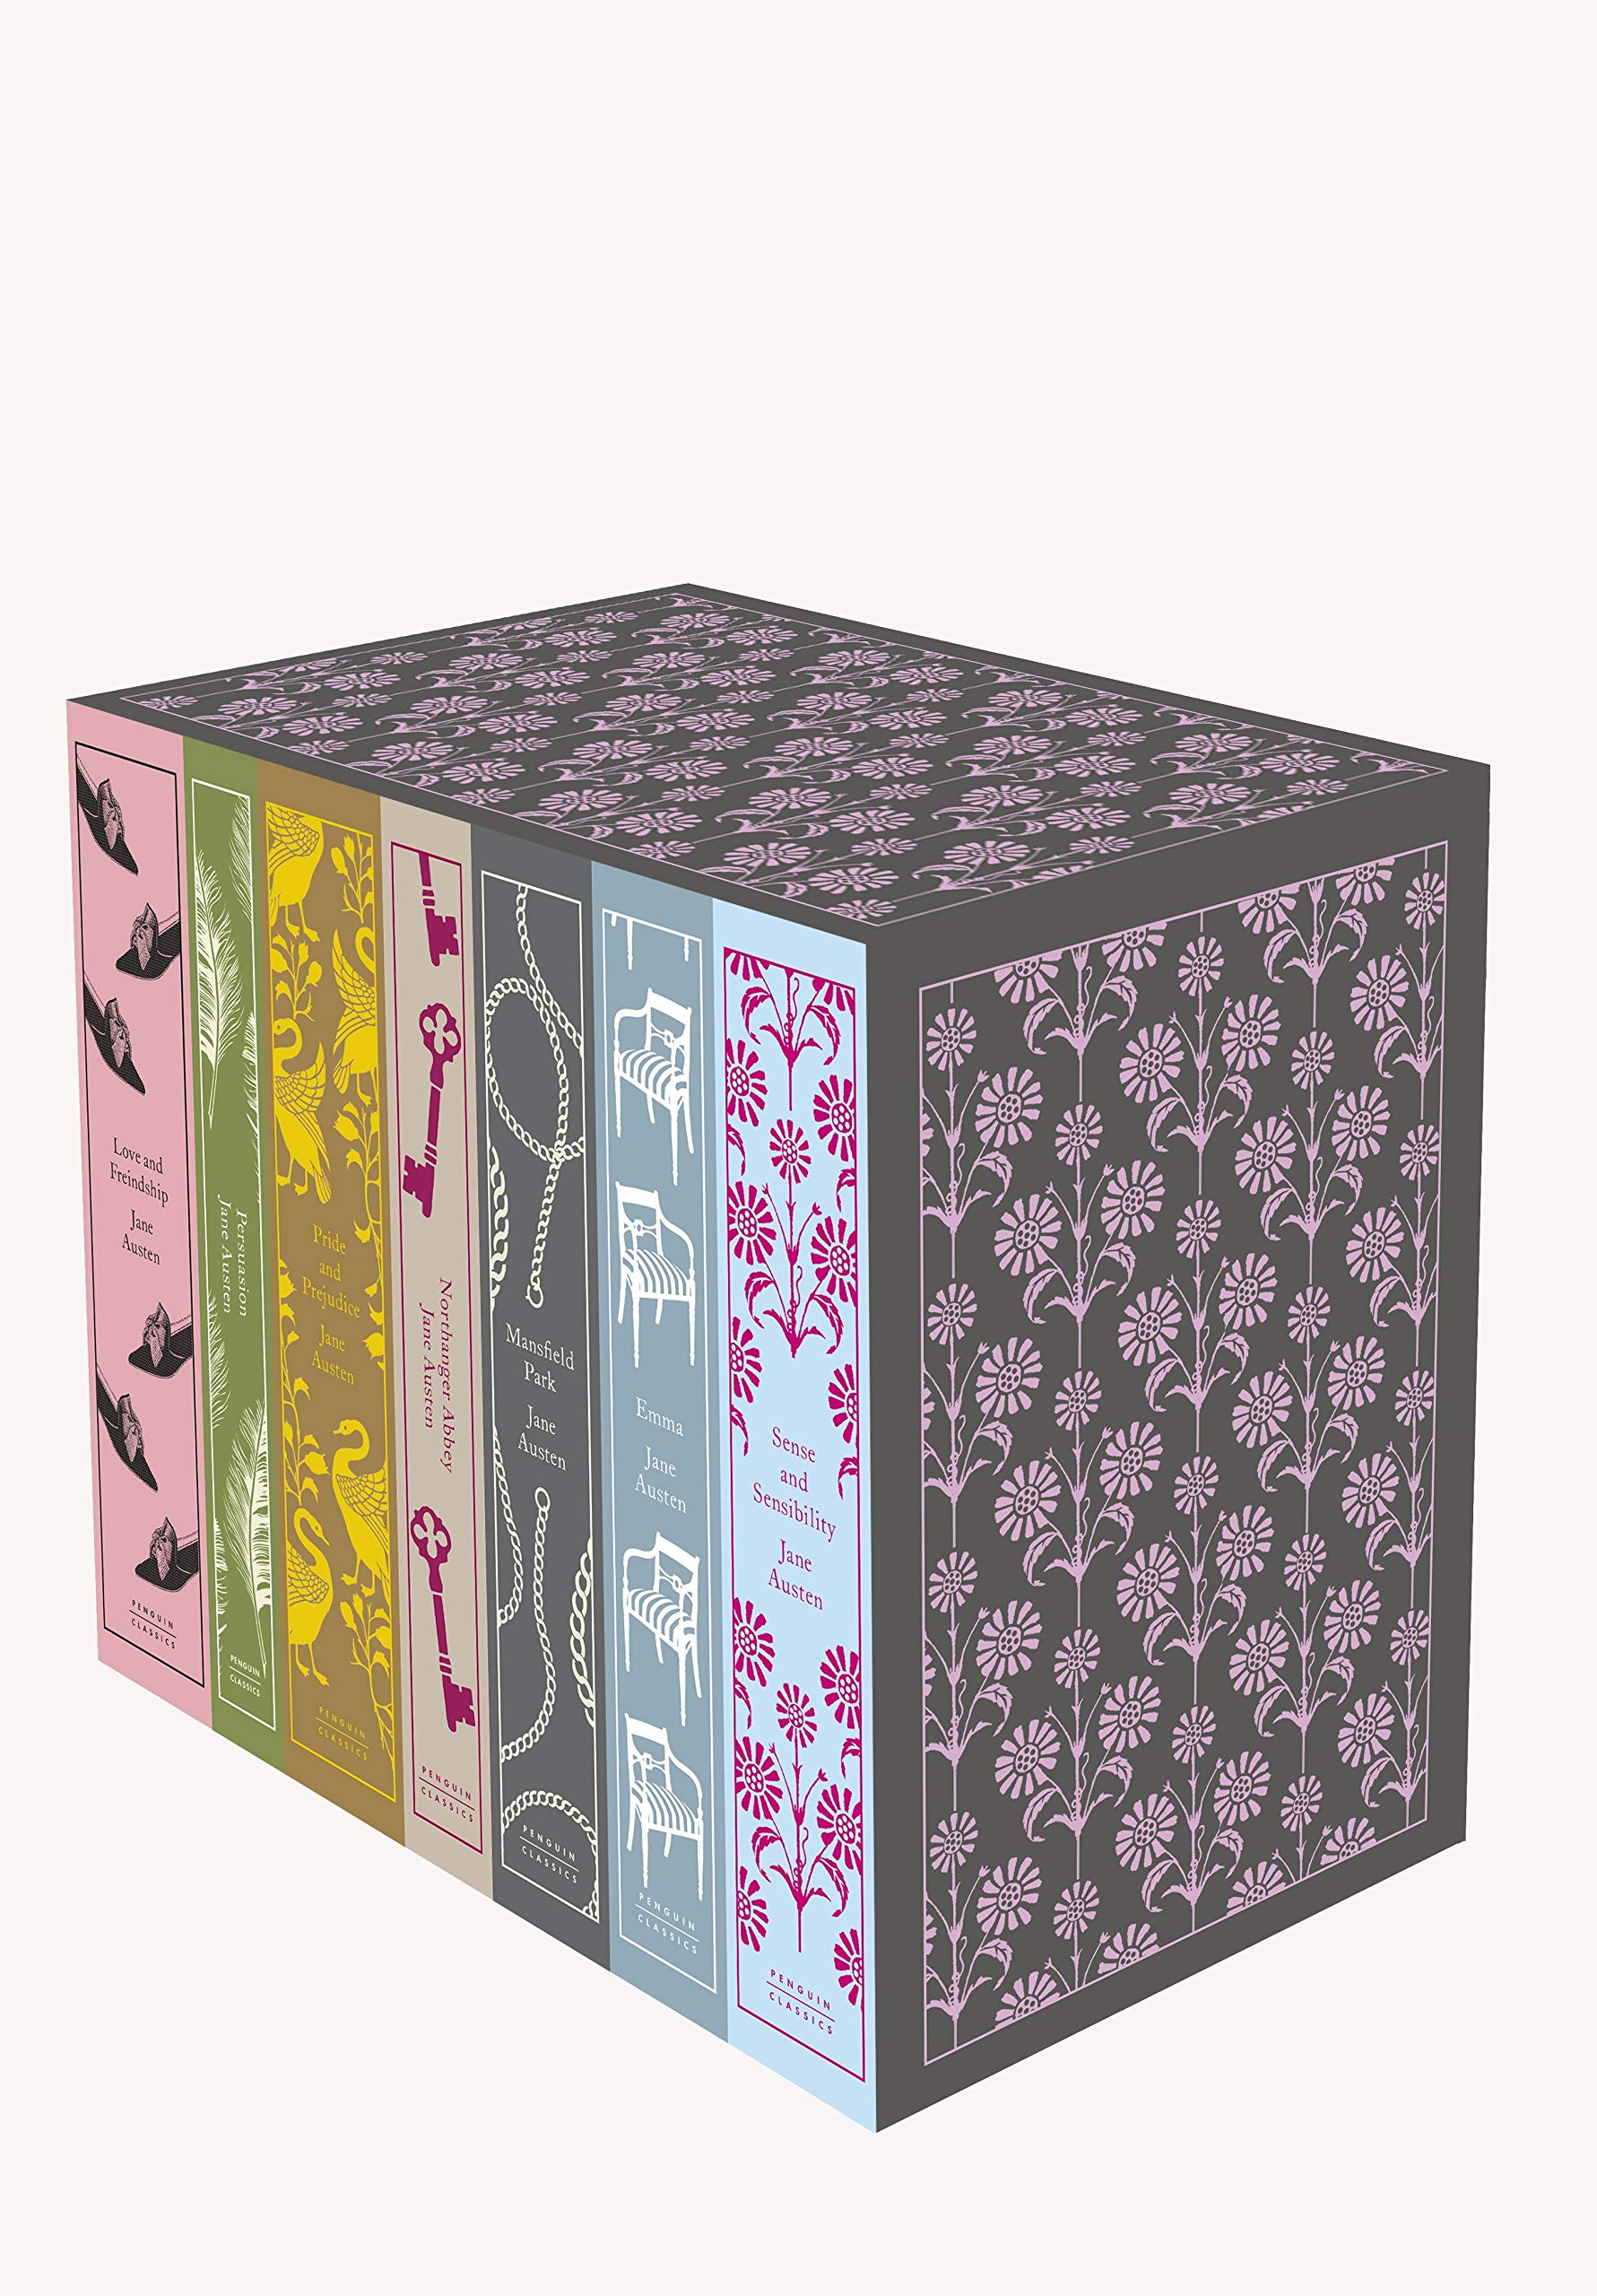 Jane Austen. The Complete Works: Classics Hardcover Boxed Set Penguin Clothbound Classics: Amazon.es: Austen, Jane: Libros en idiomas extranjeros